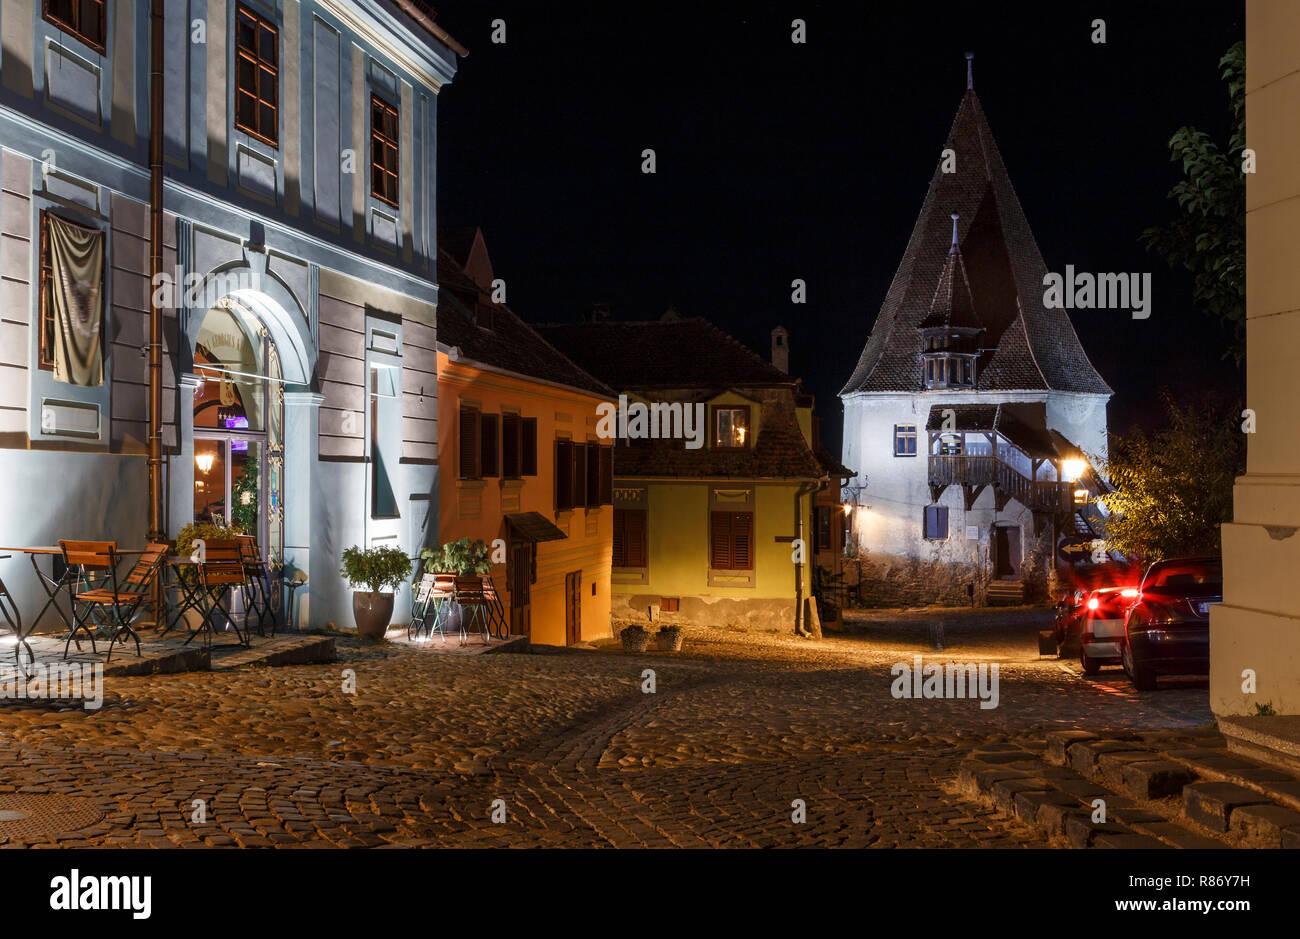 Old saxon town Sighisoara, Romania, night view of the Bastion Tower, Transylvania - Stock Image